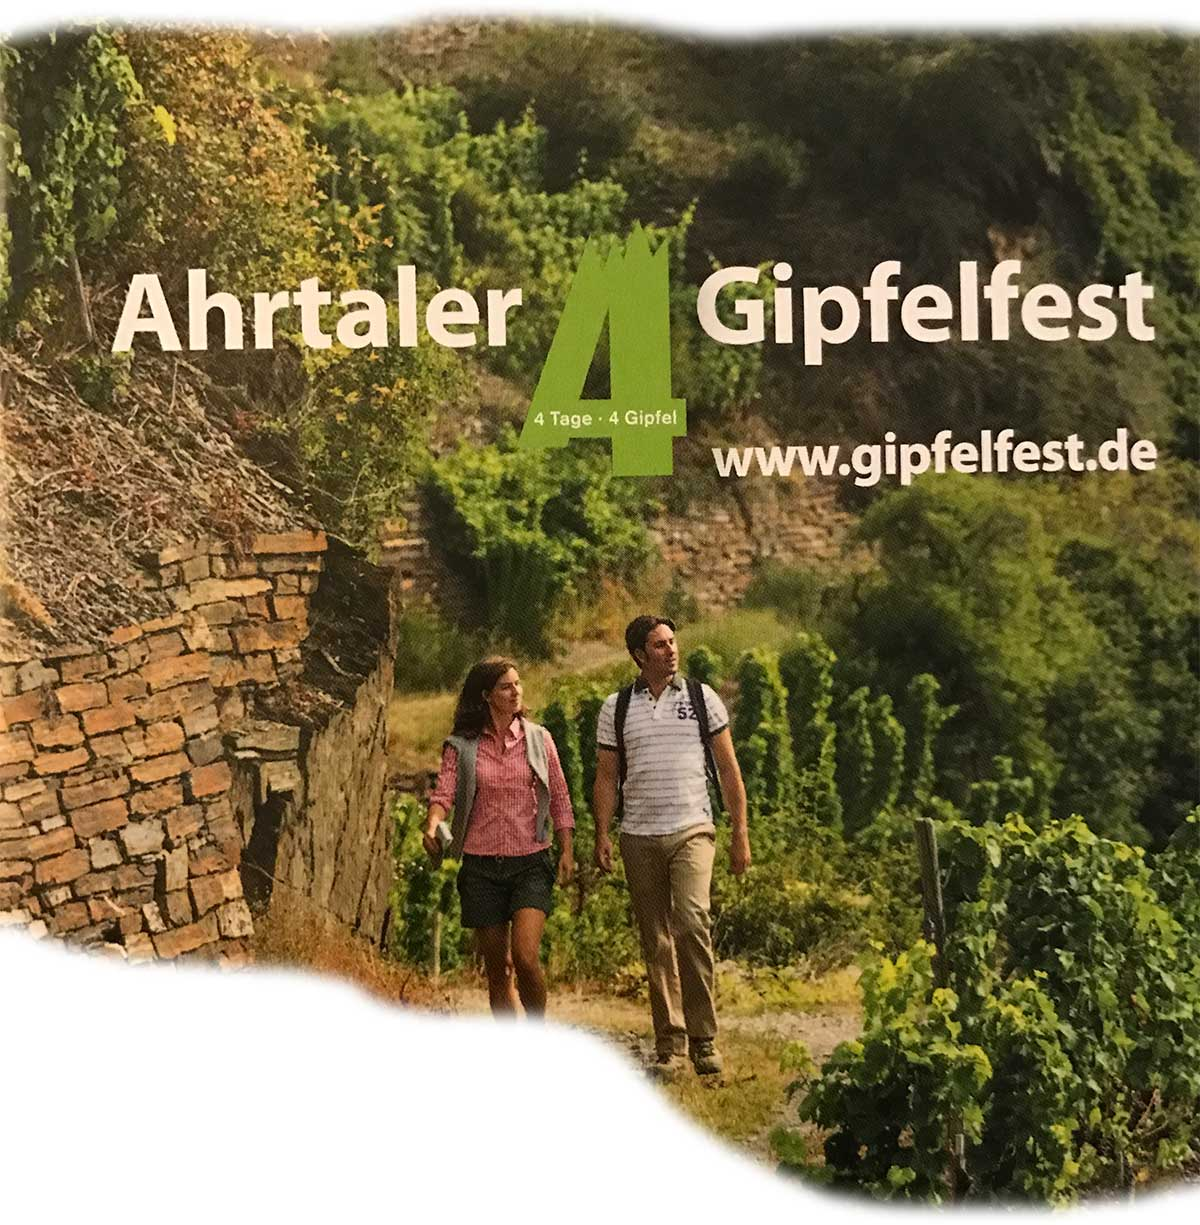 Ahrtaler Gipfelfest, 4 Tage 4 Gipfel im Ahrtal